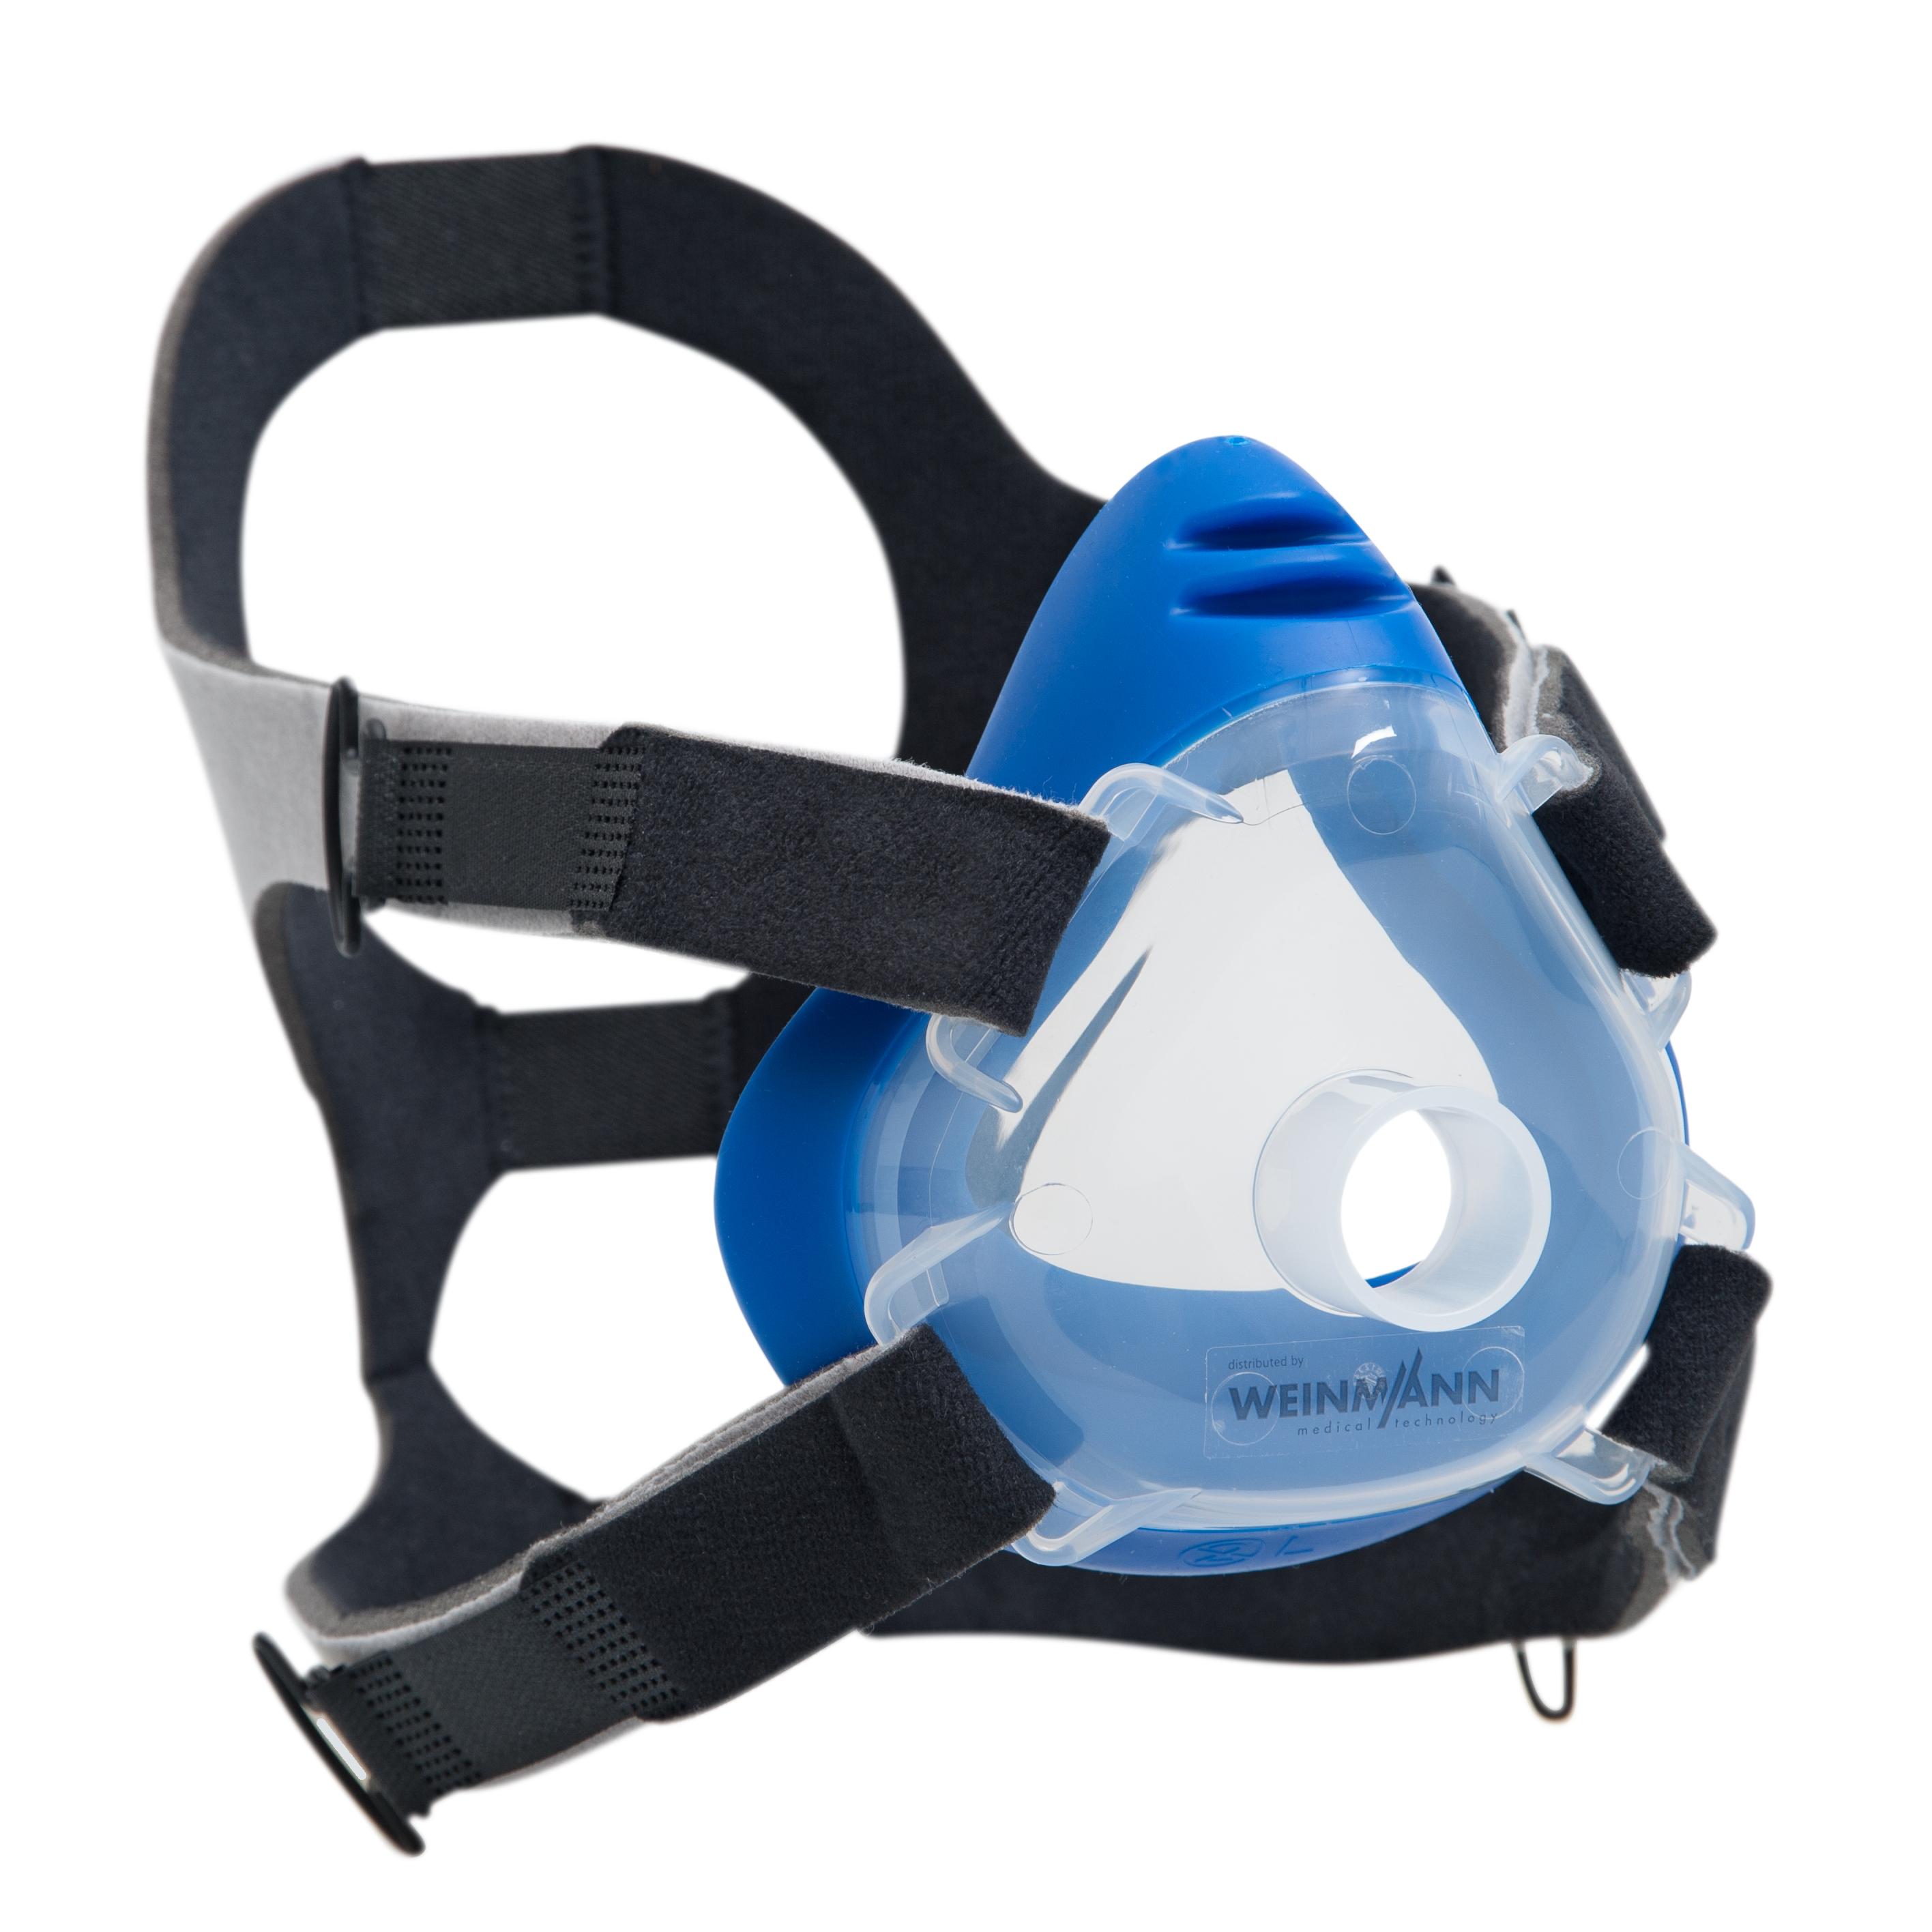 Premium CPAP-/NIV-Einwegmaske inkl. Kopfbänderung  Größe L (großer Erwachsener), 10er-Set